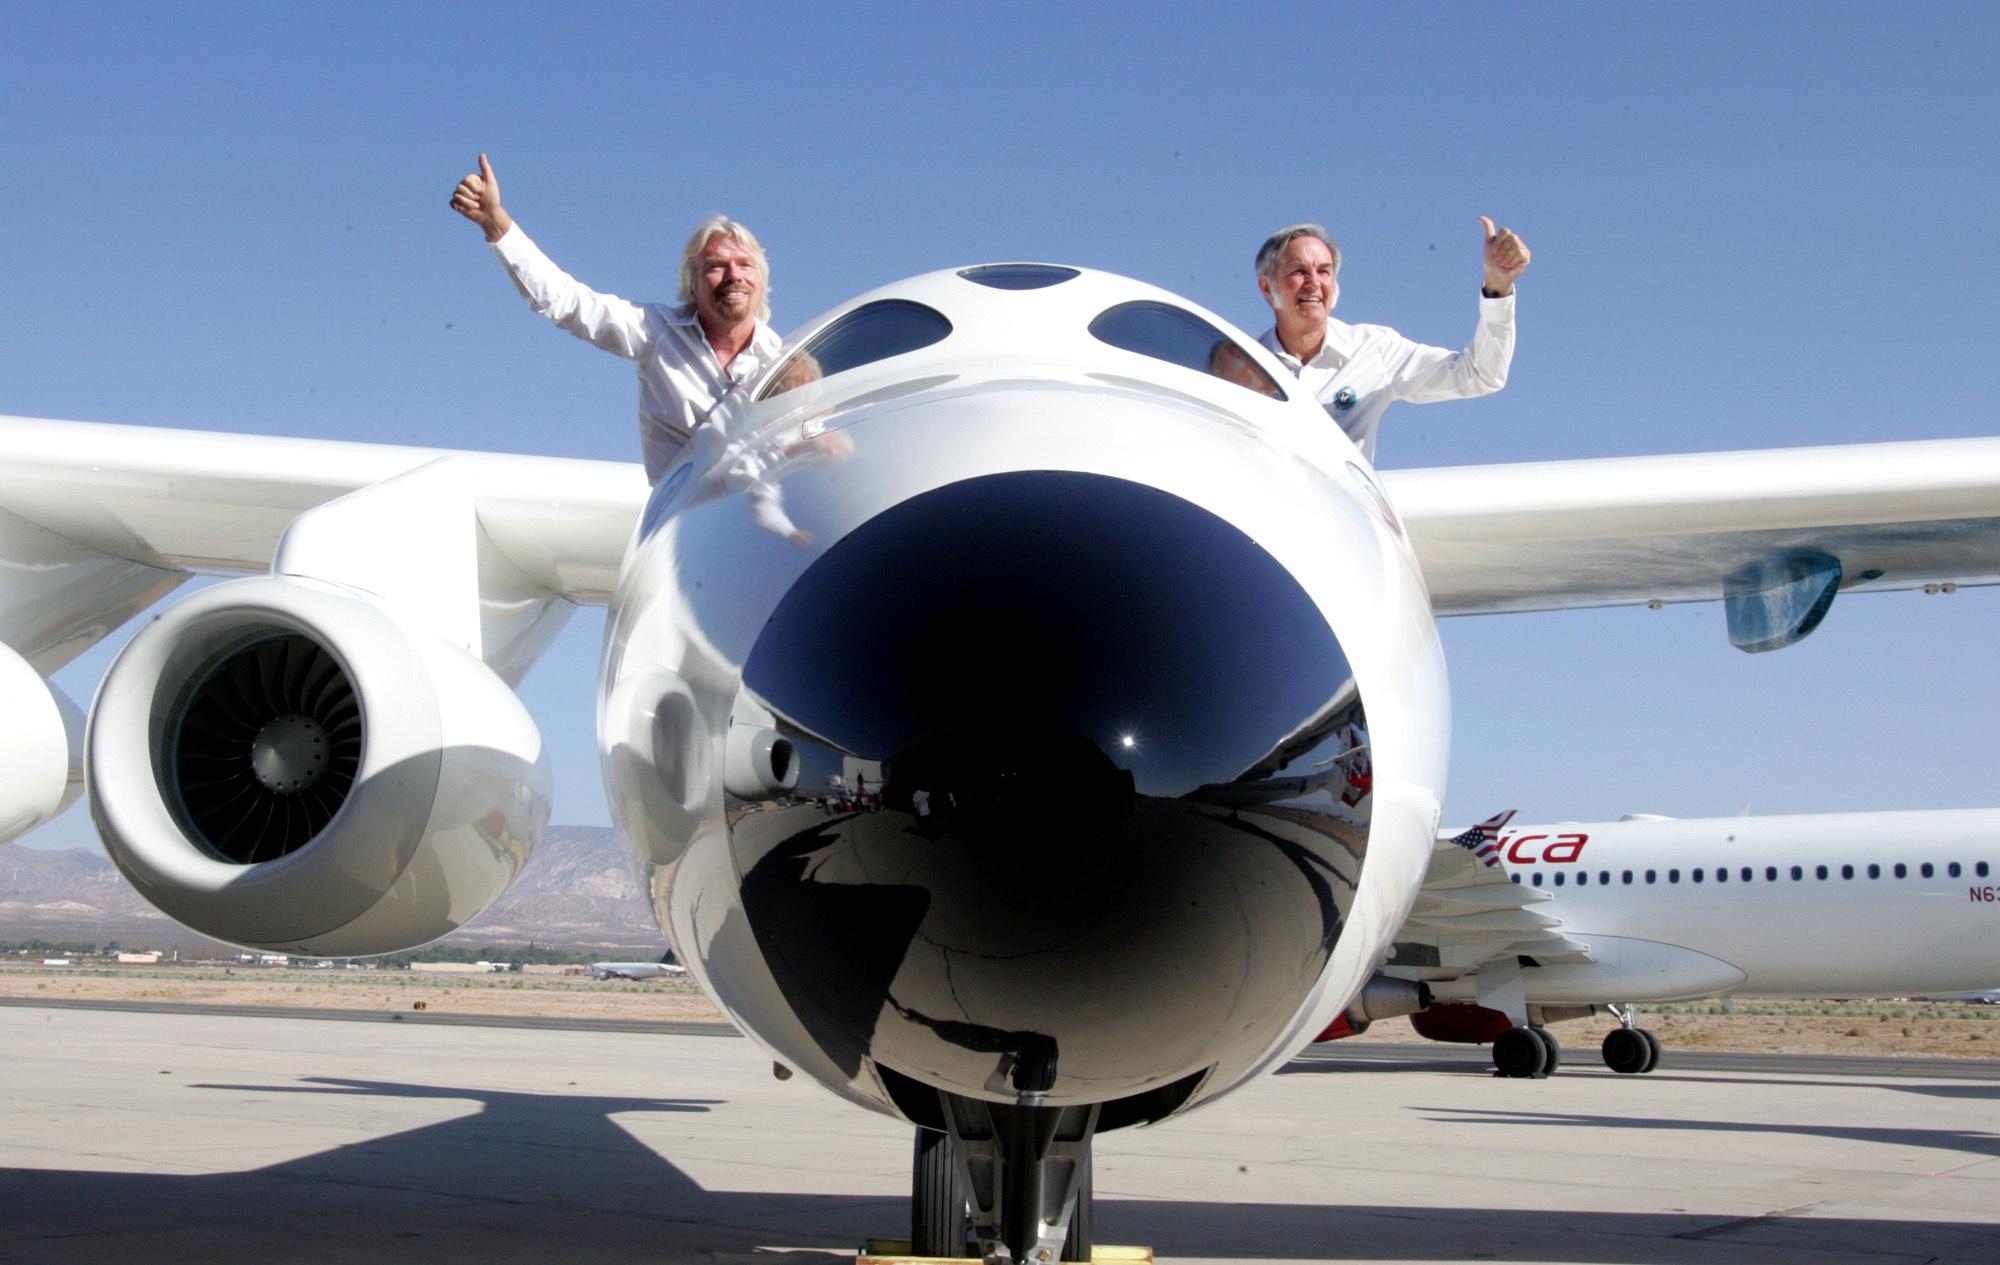 Virgin galactic shows off mothership aircraft